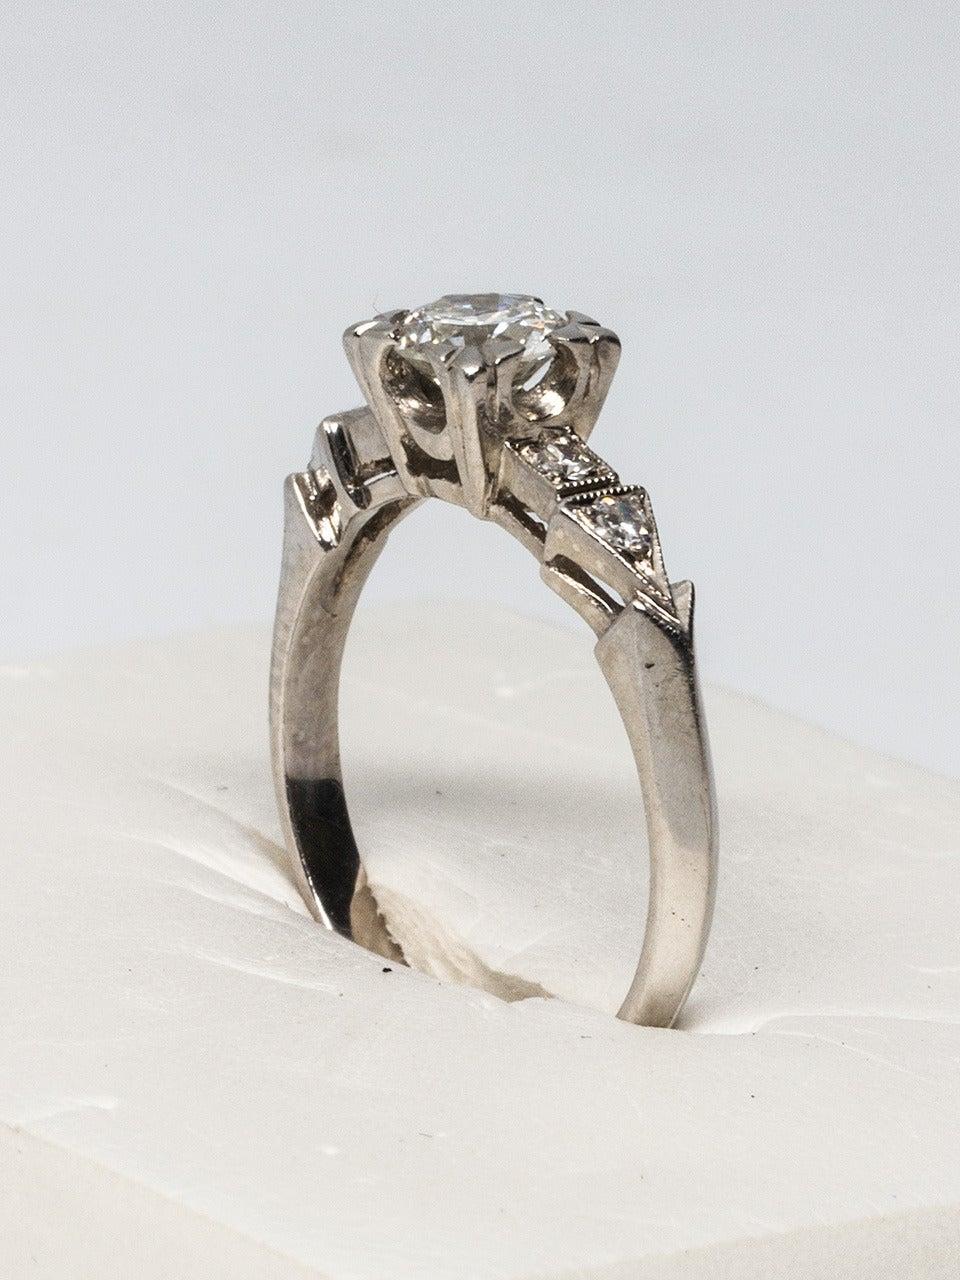 1940s Platinum And Old European Cut Diamond Engagement